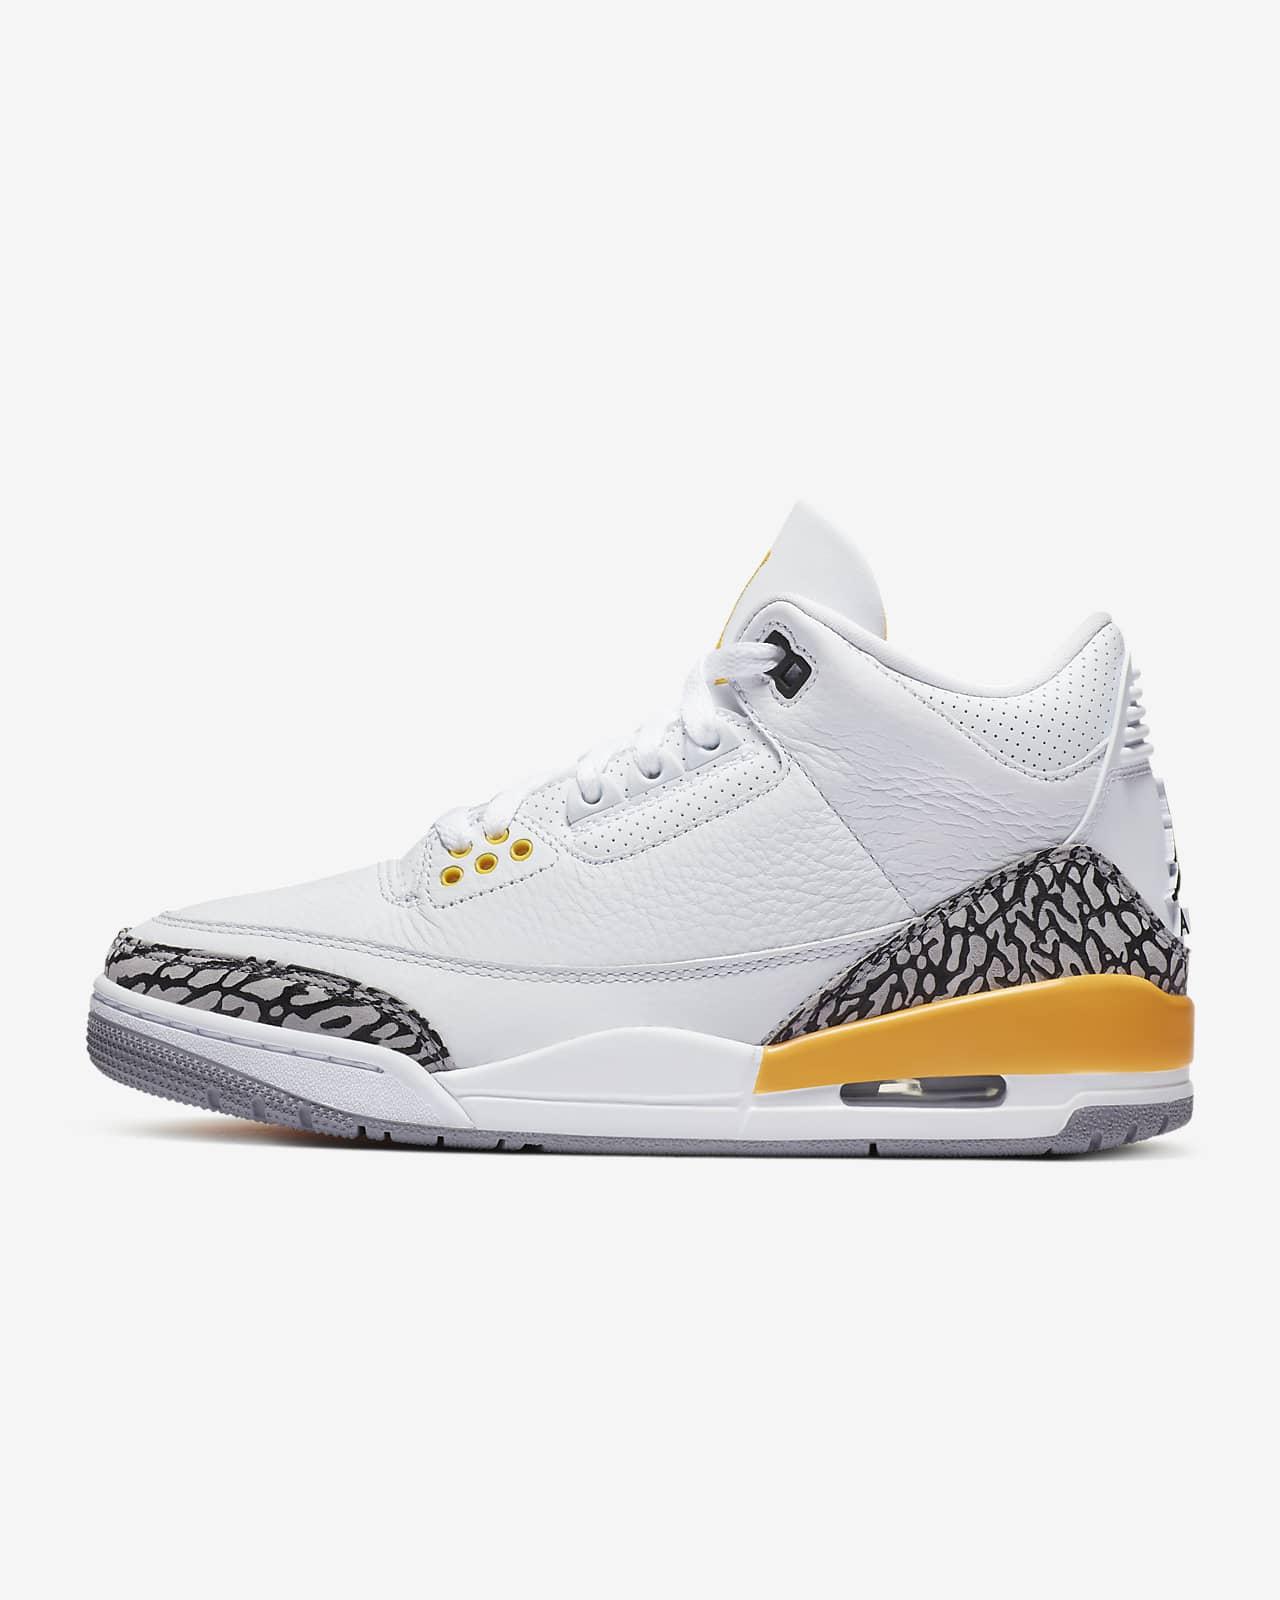 air jordan 3 running shoe Shop Clothing